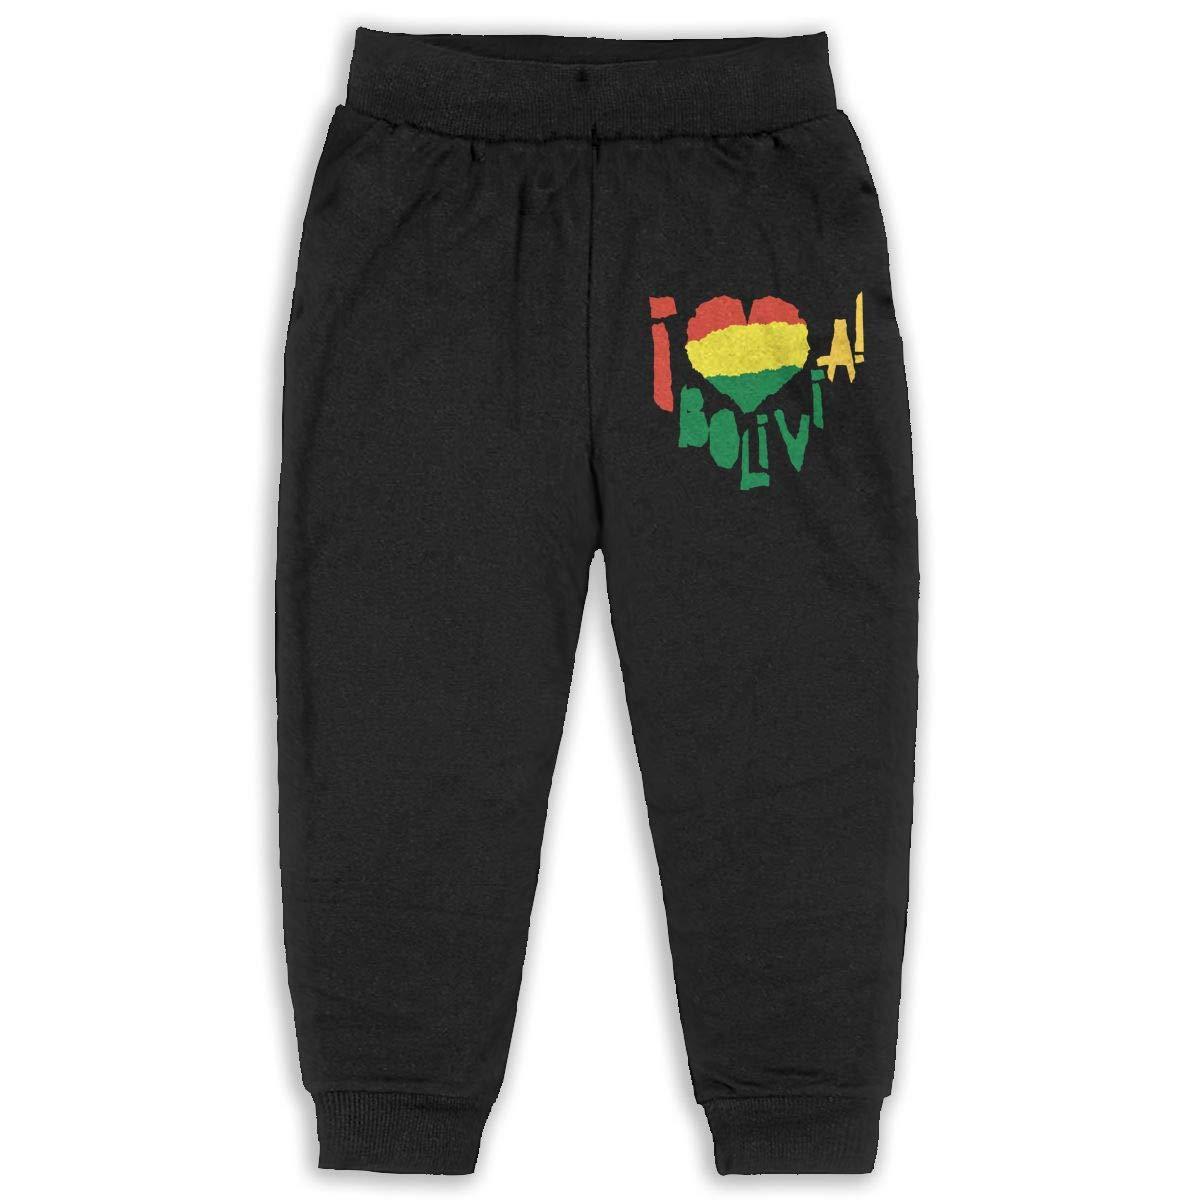 Kids /& Toddler Pants Soft Cozy Baby Sweatpants Love Bolivia Fleece Pants Jogger Pants